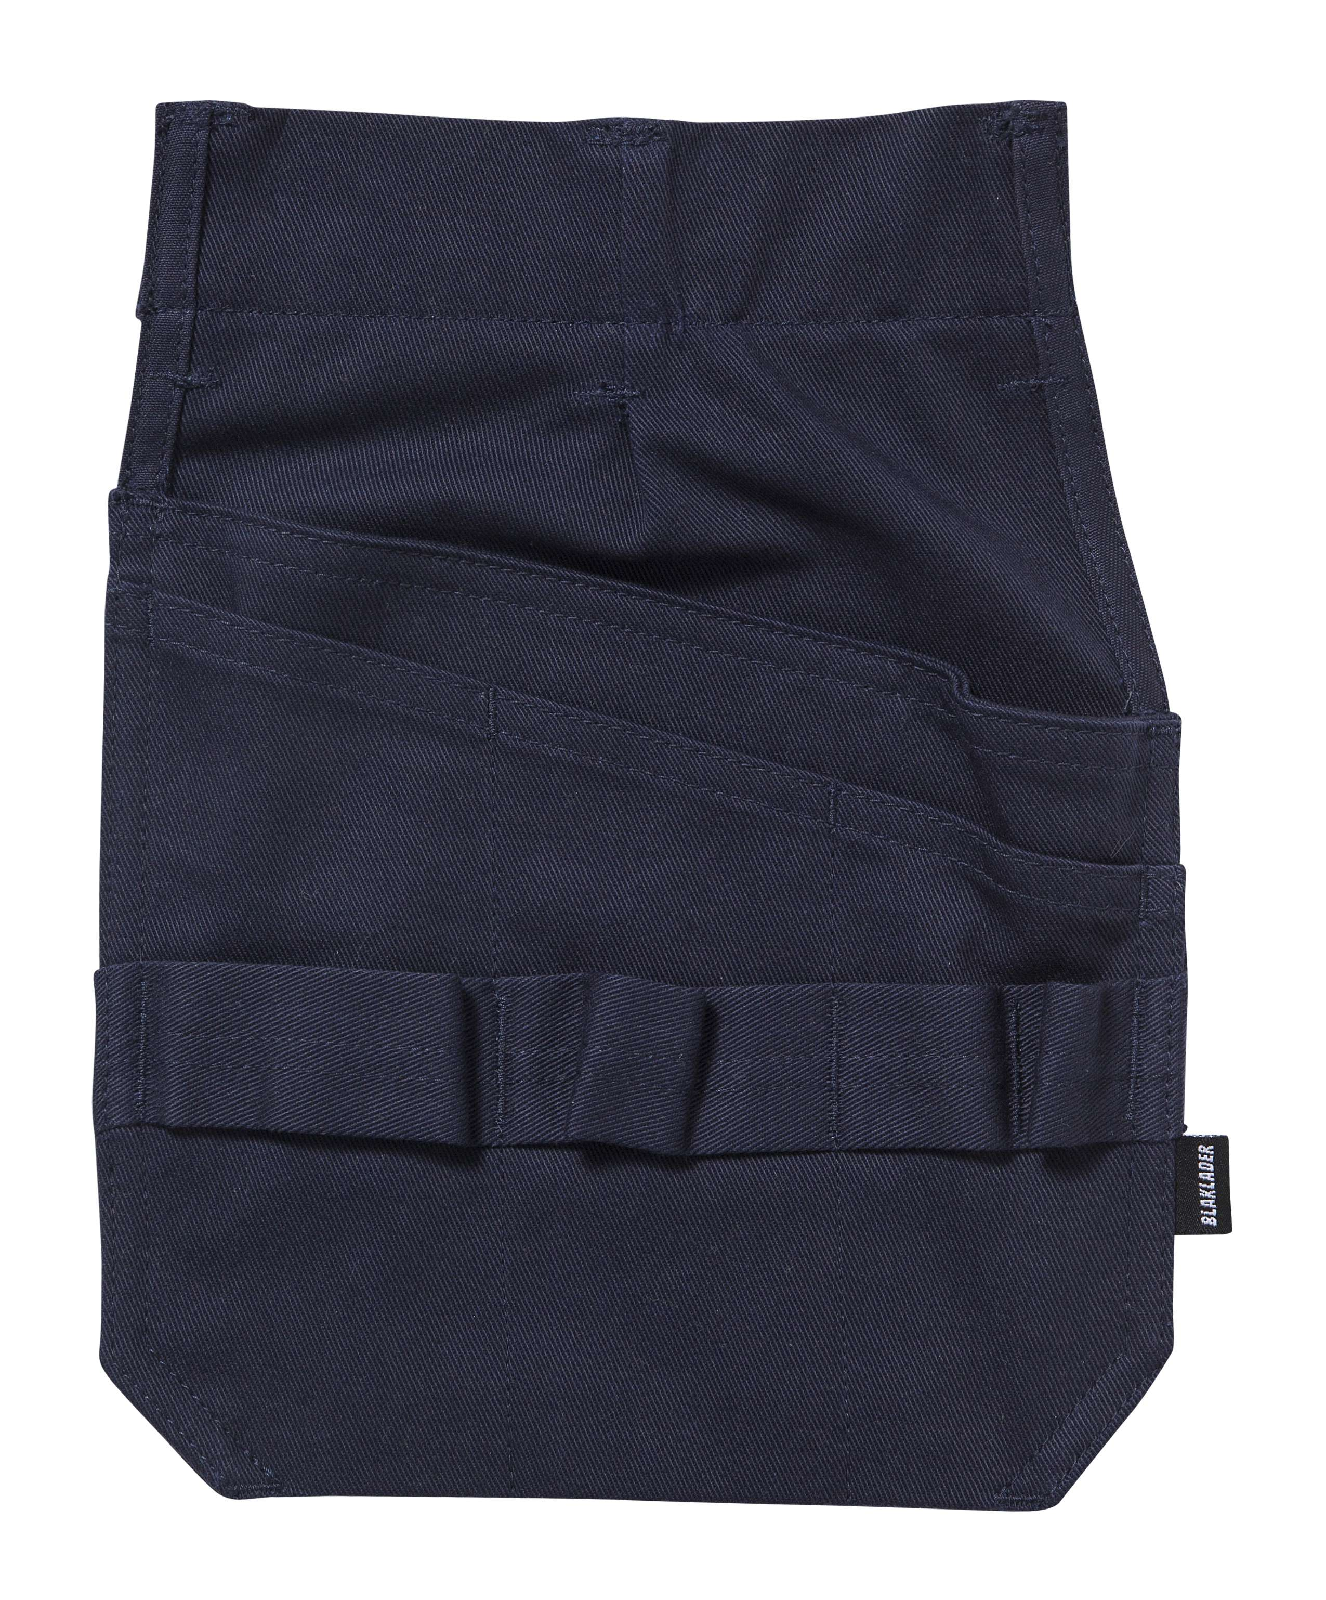 Blaklader Swingpockets 15161514 Vlamvertragend marineblauw(8900)